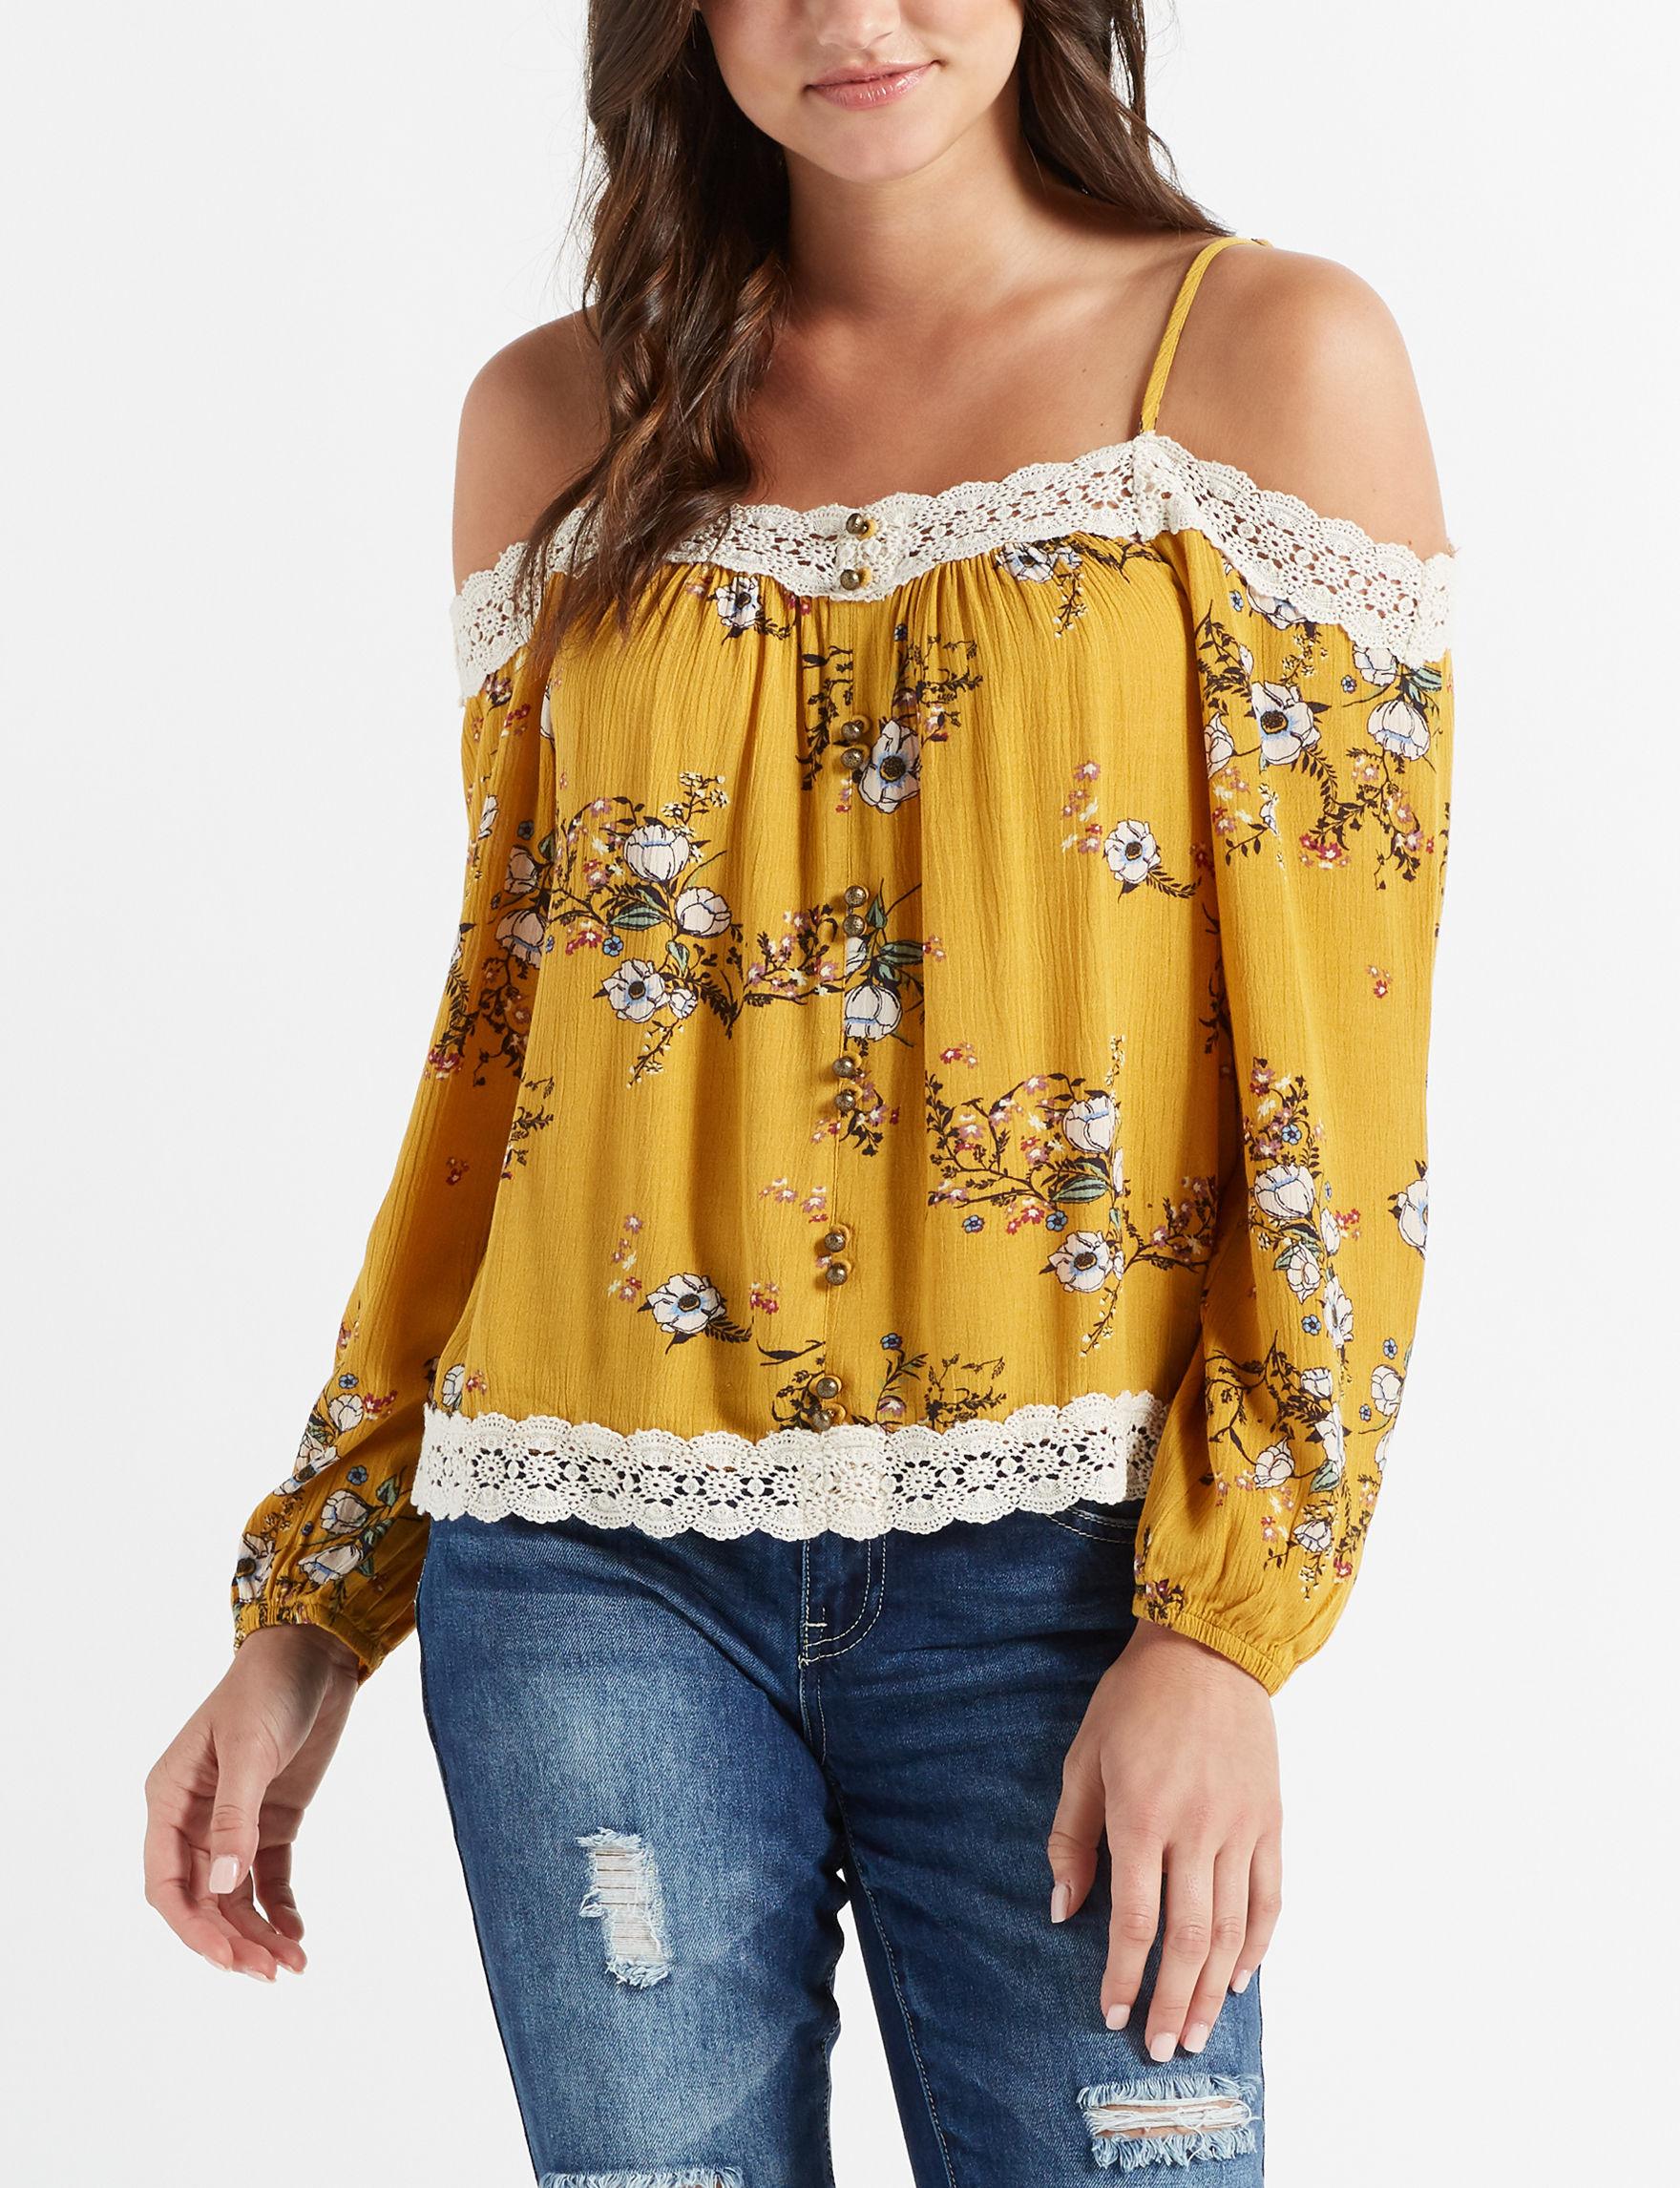 Jolt Mustard Shirts & Blouses